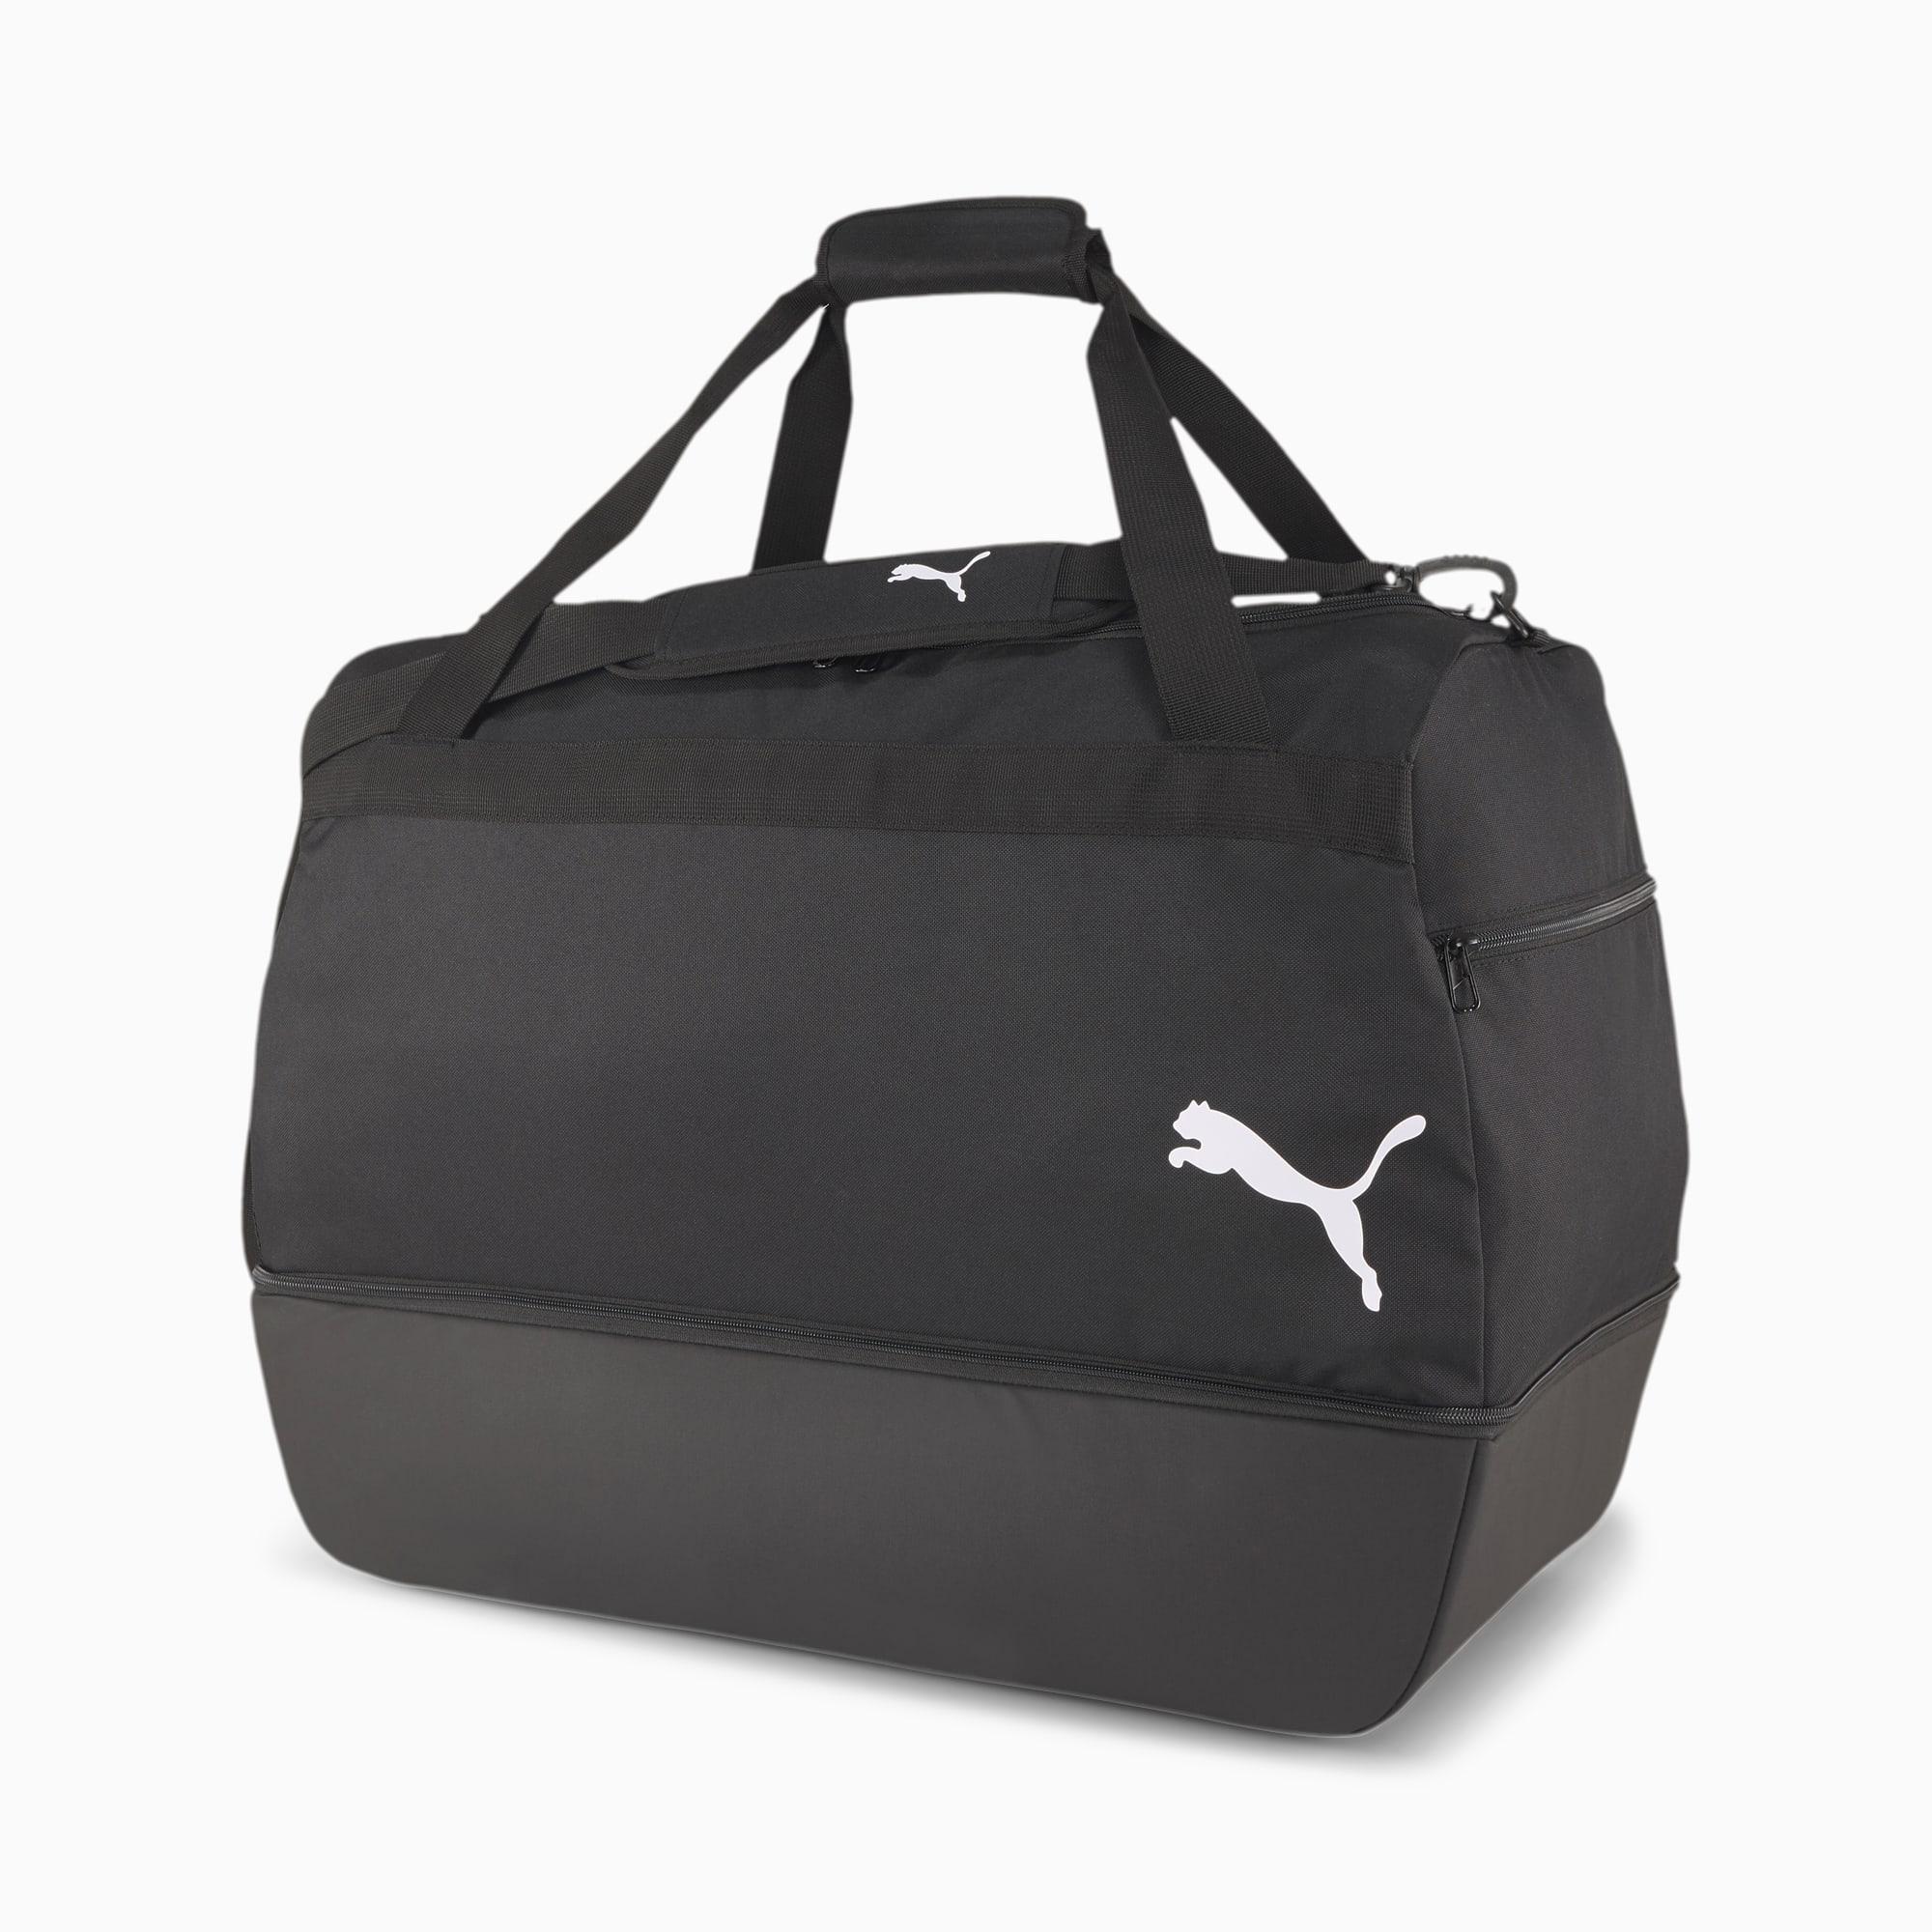 teamGOAL Football Duffel Bag